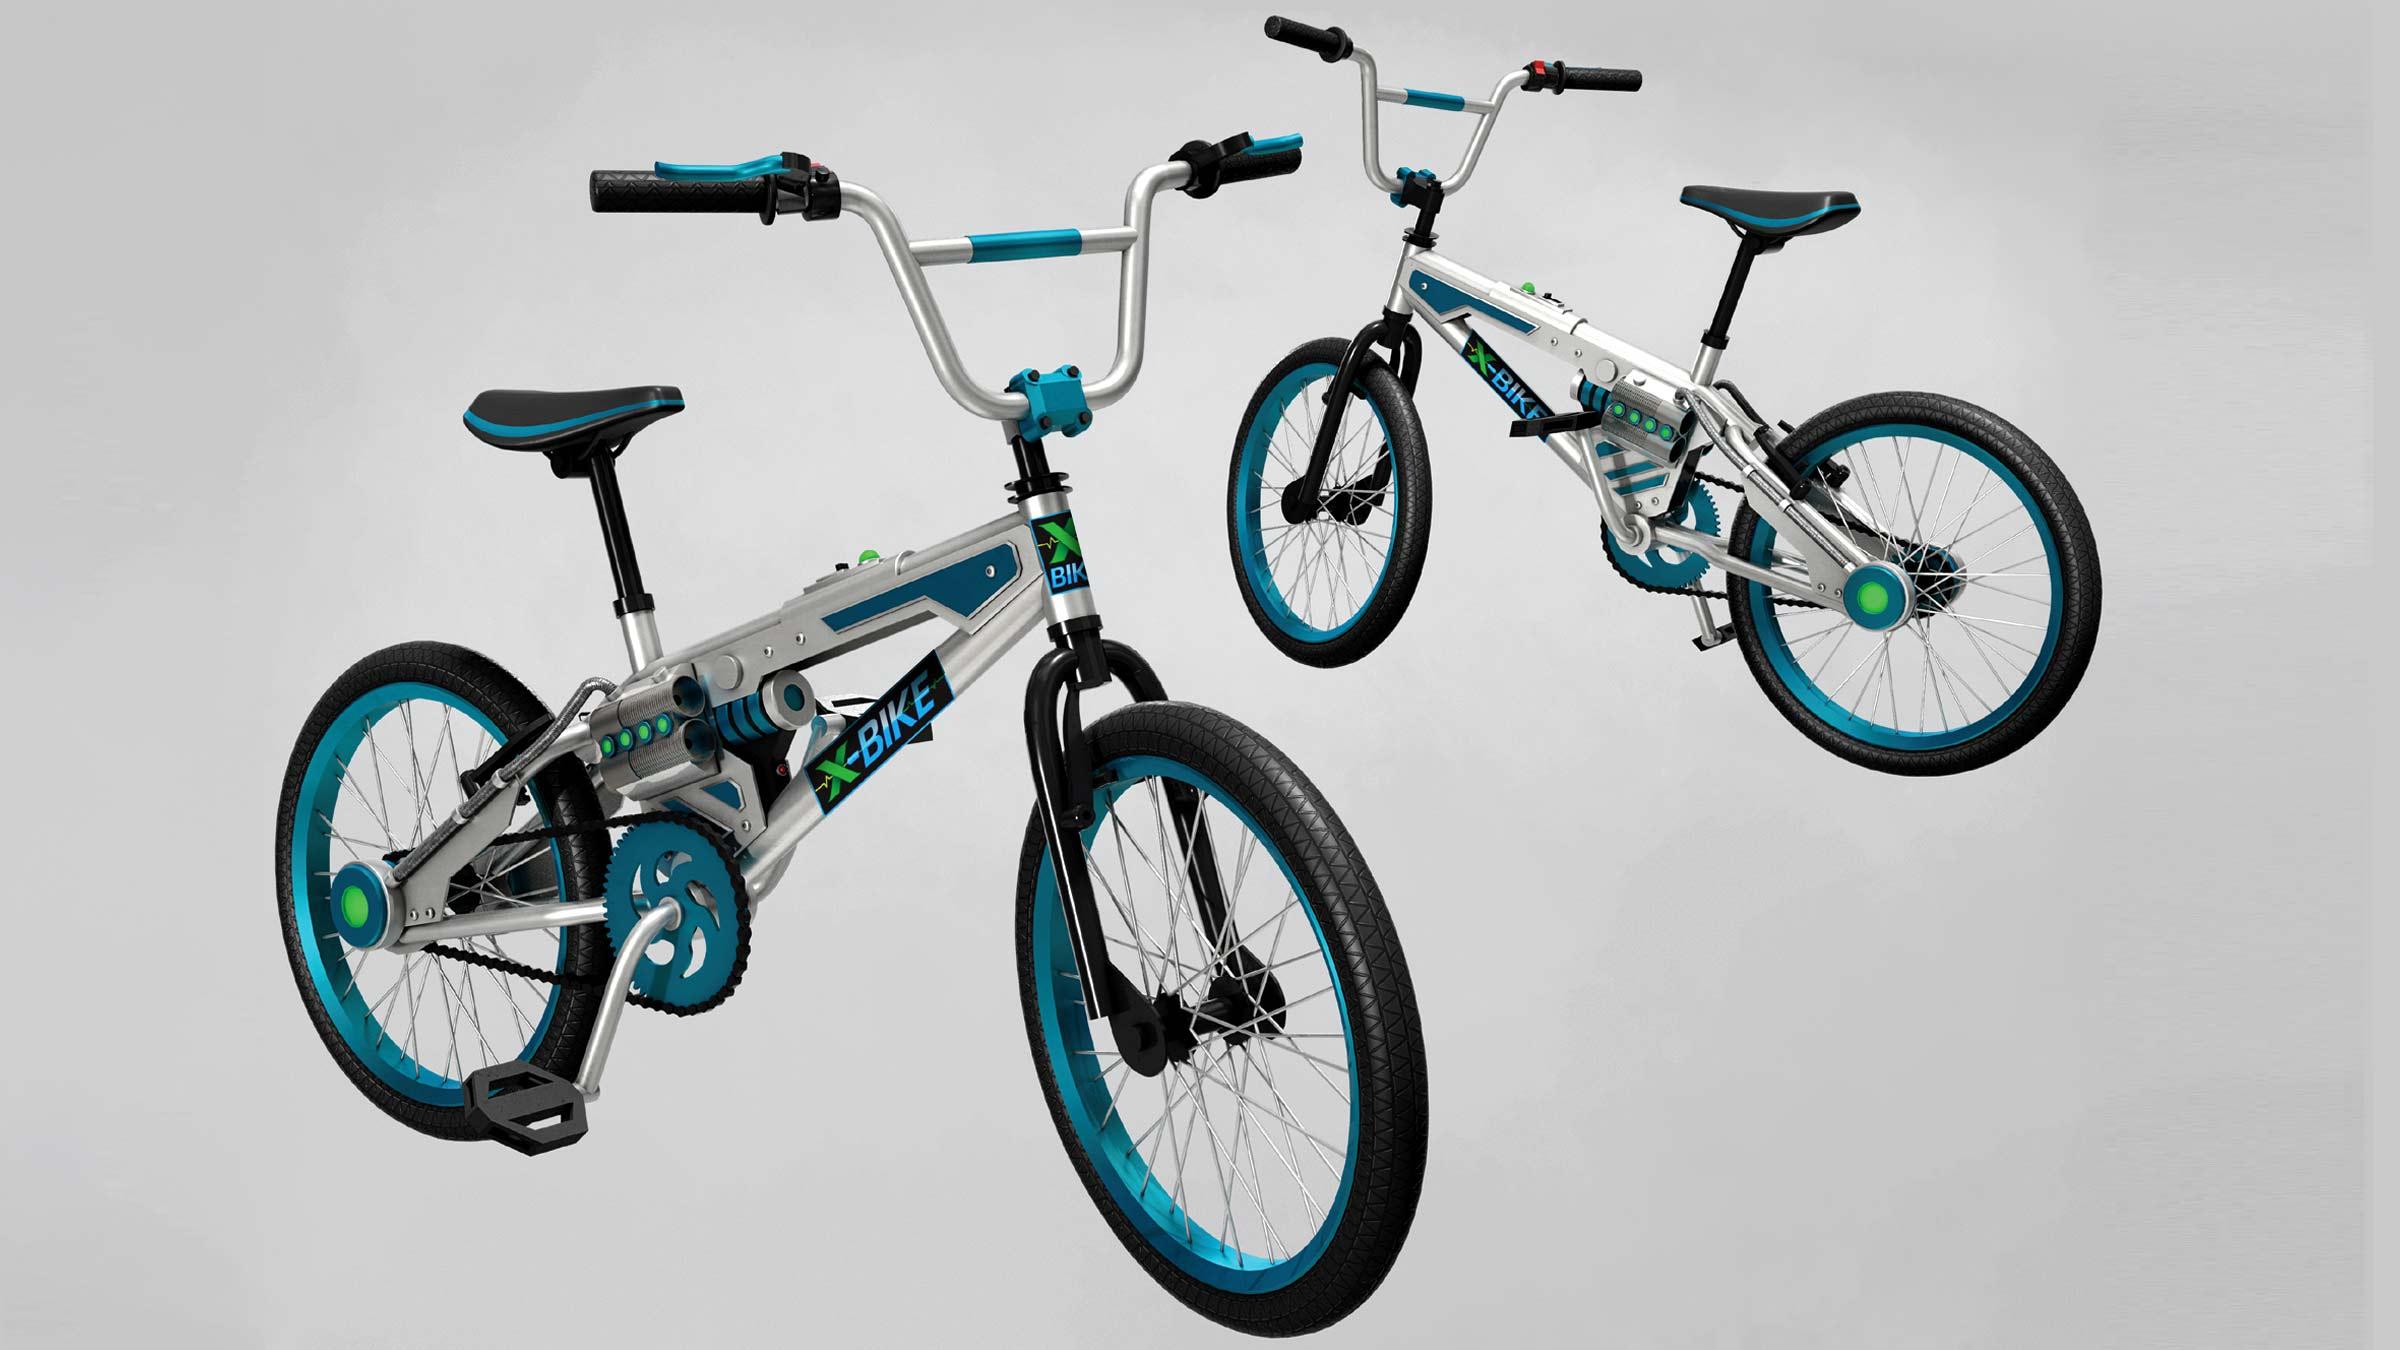 X-Bike Prop Design - Concept sketch views